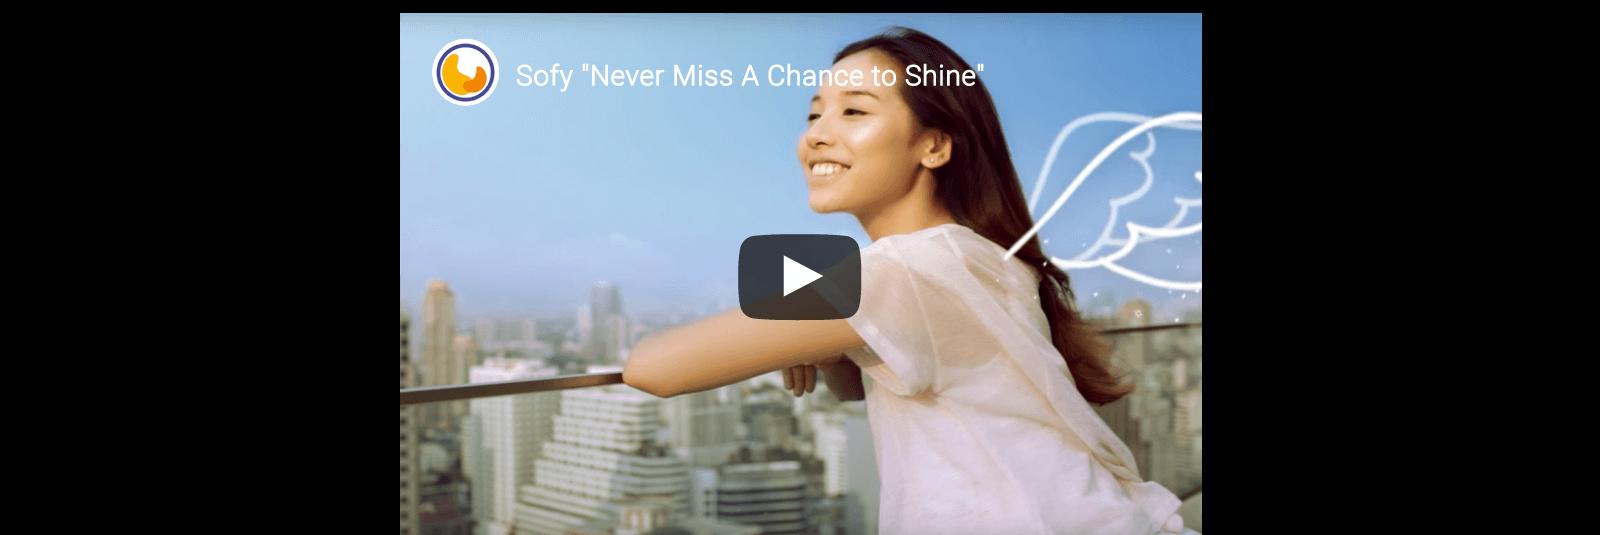 Sofy Video - Brand Video